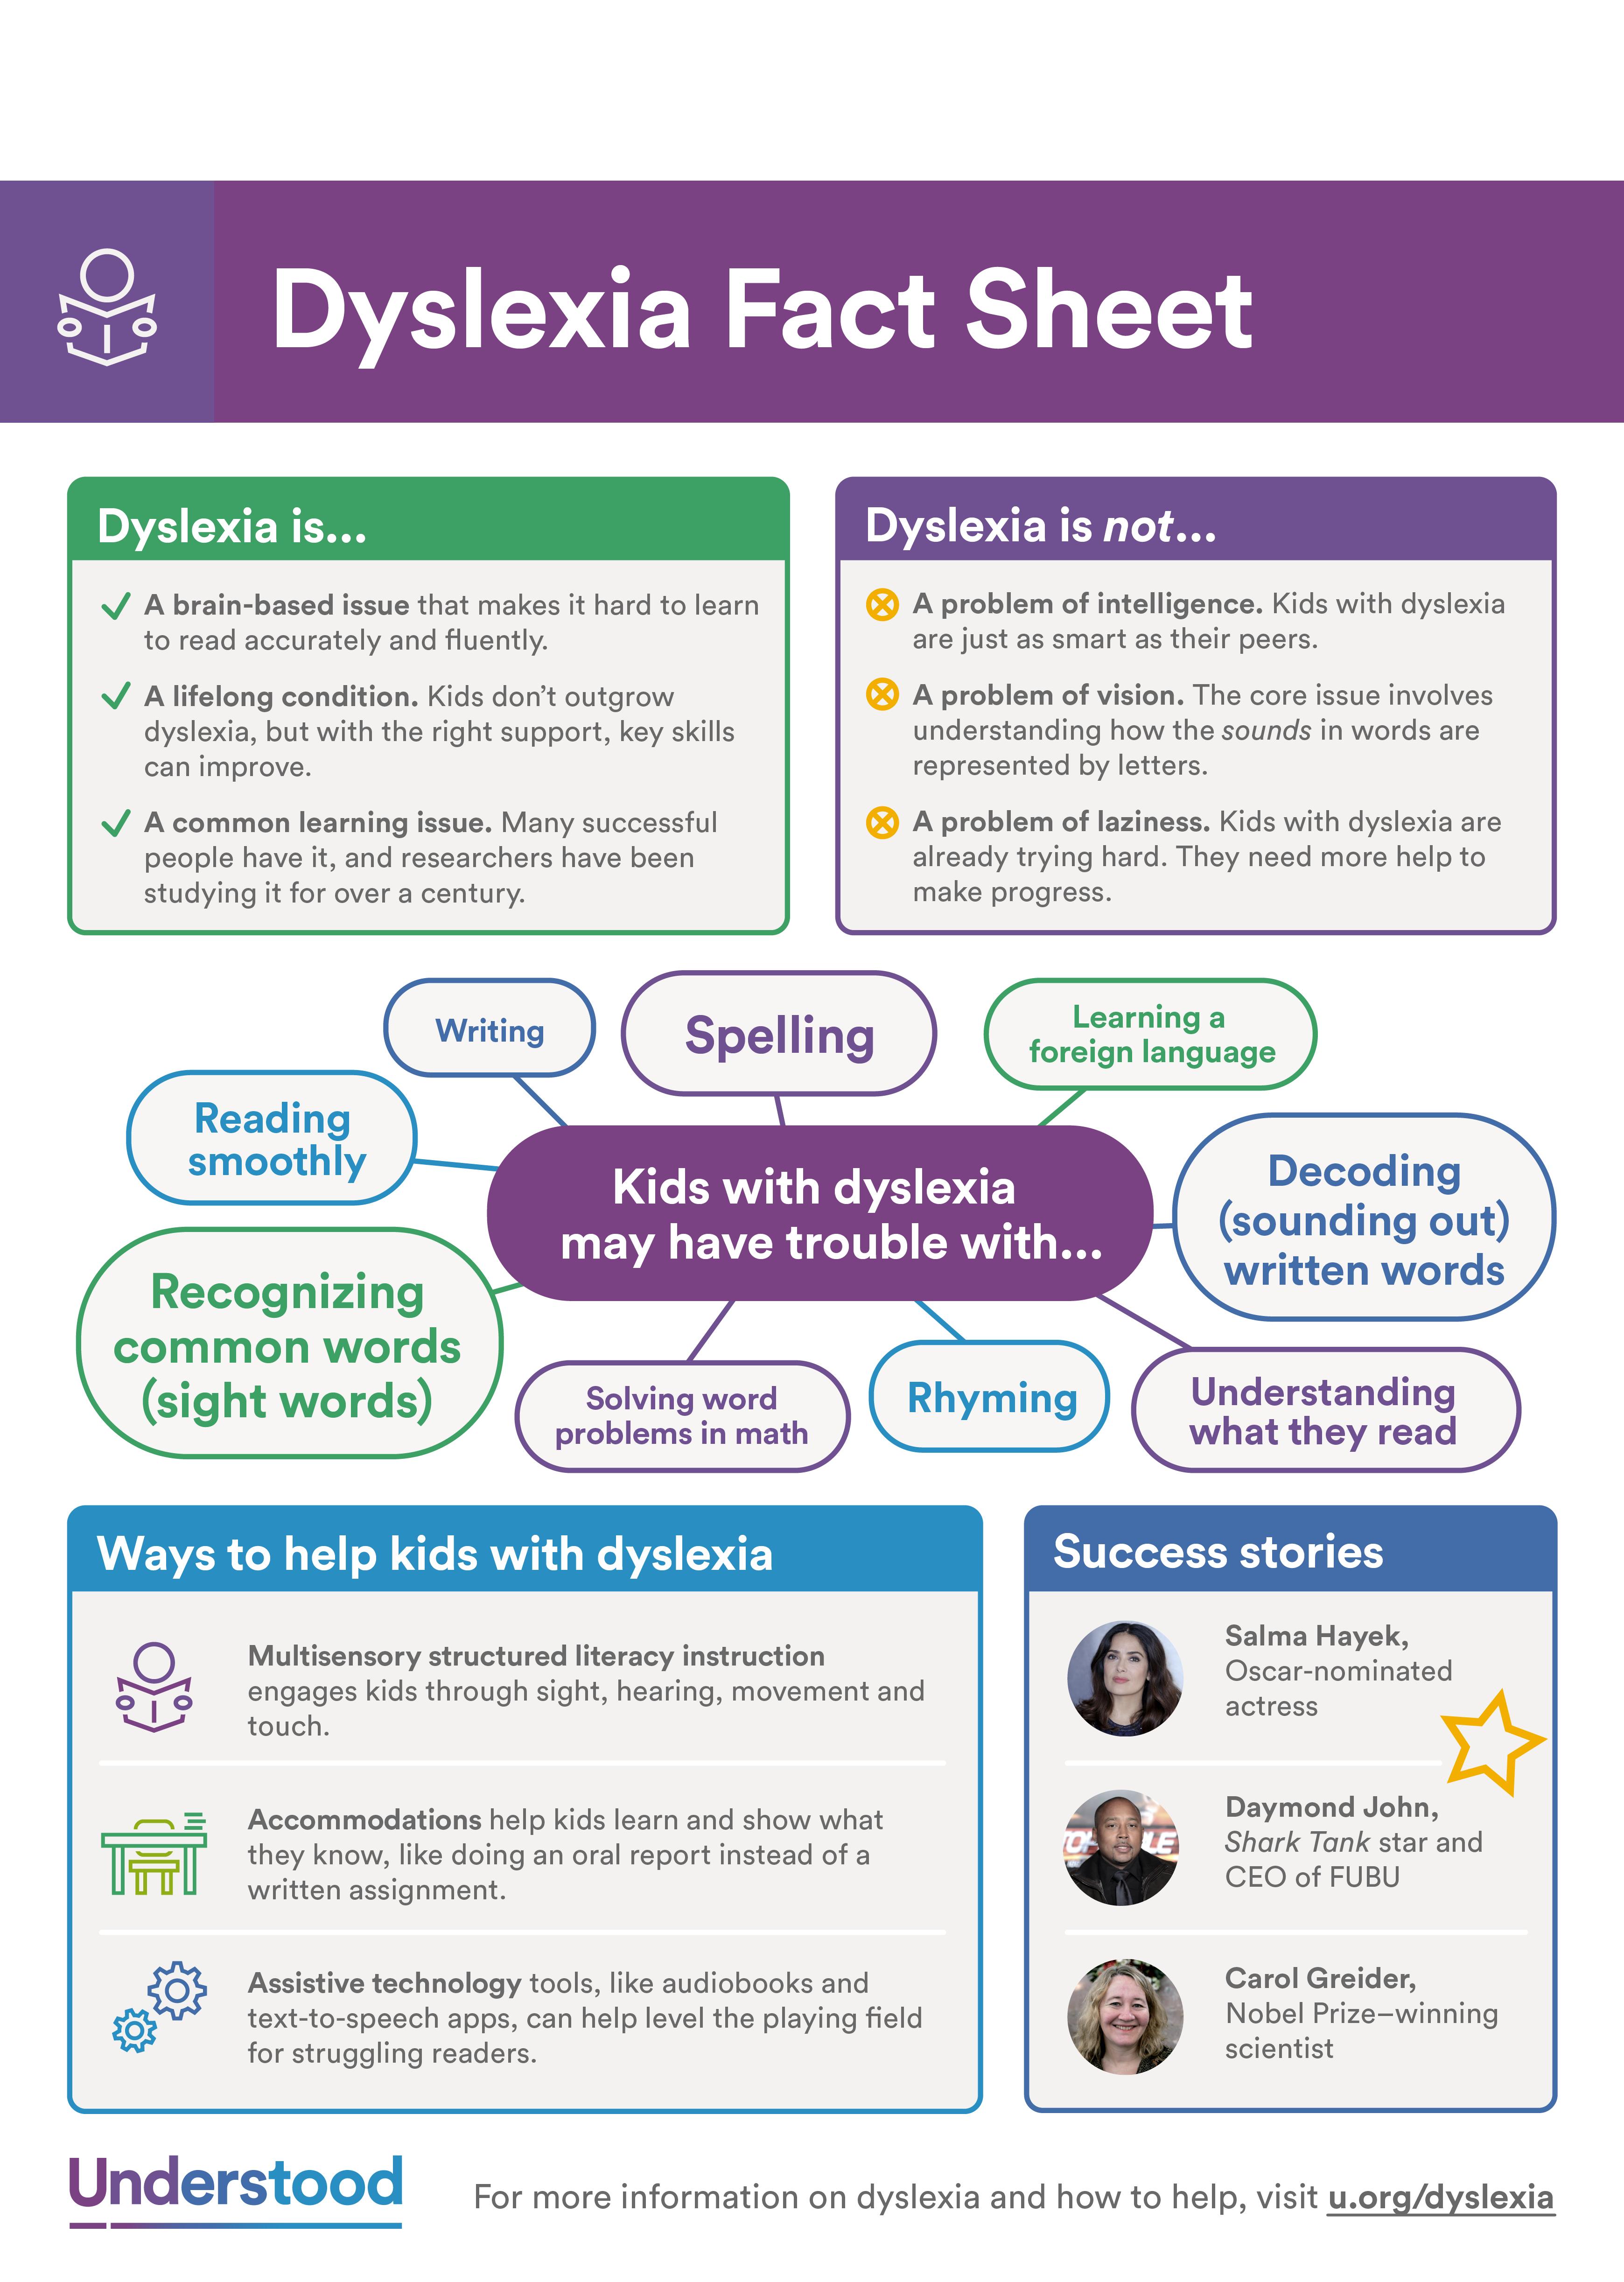 dyslexia fact sheet teaching articles dyslexia teaching dyslexia dyslexia strategies. Black Bedroom Furniture Sets. Home Design Ideas